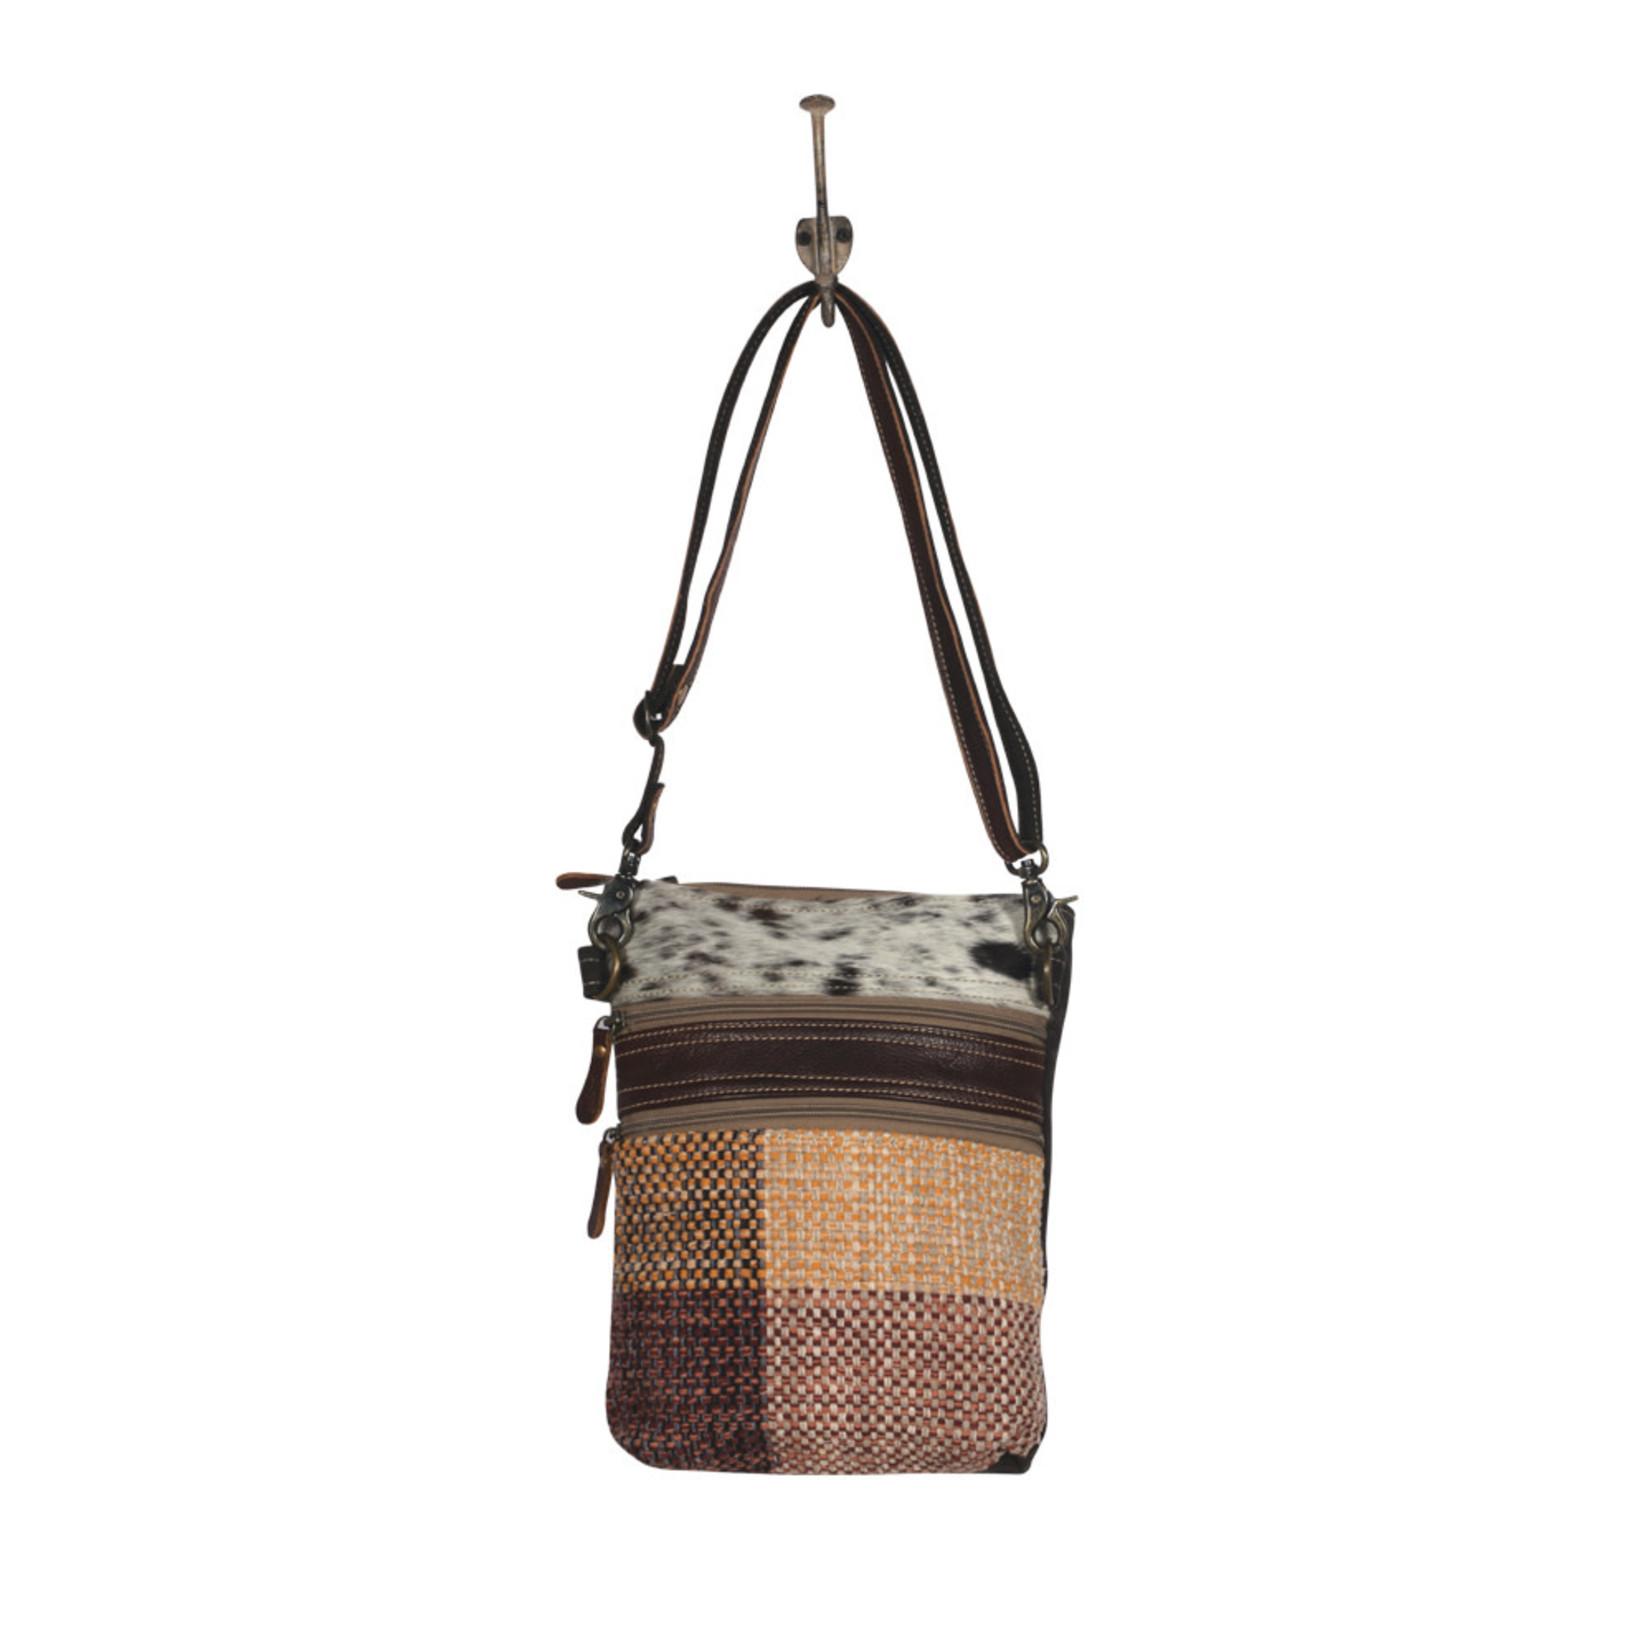 Myra Bags S-2010 Furry One Small & Crossbody Bag